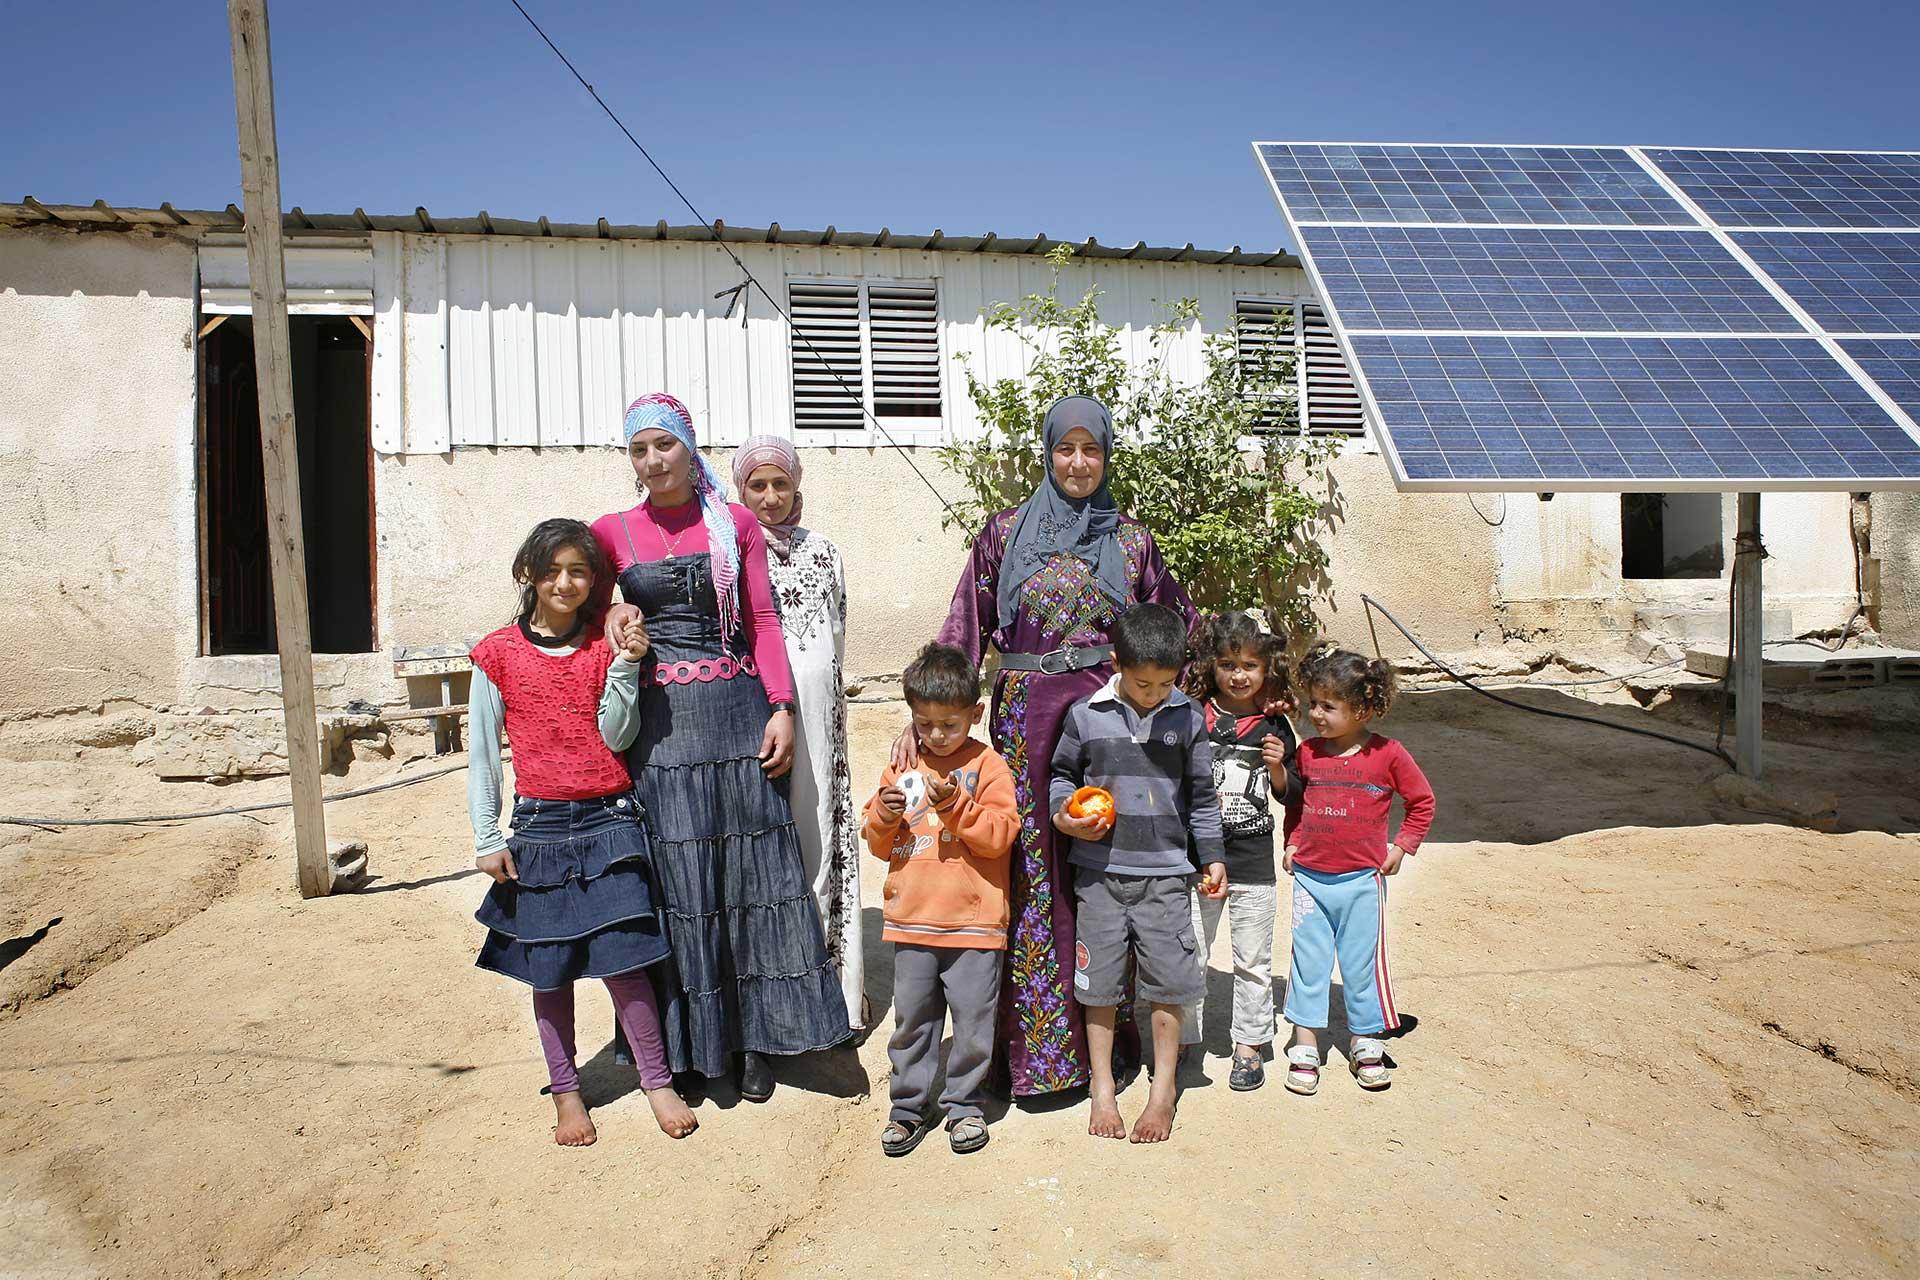 Unrecognized village of Attir, Israel 2014